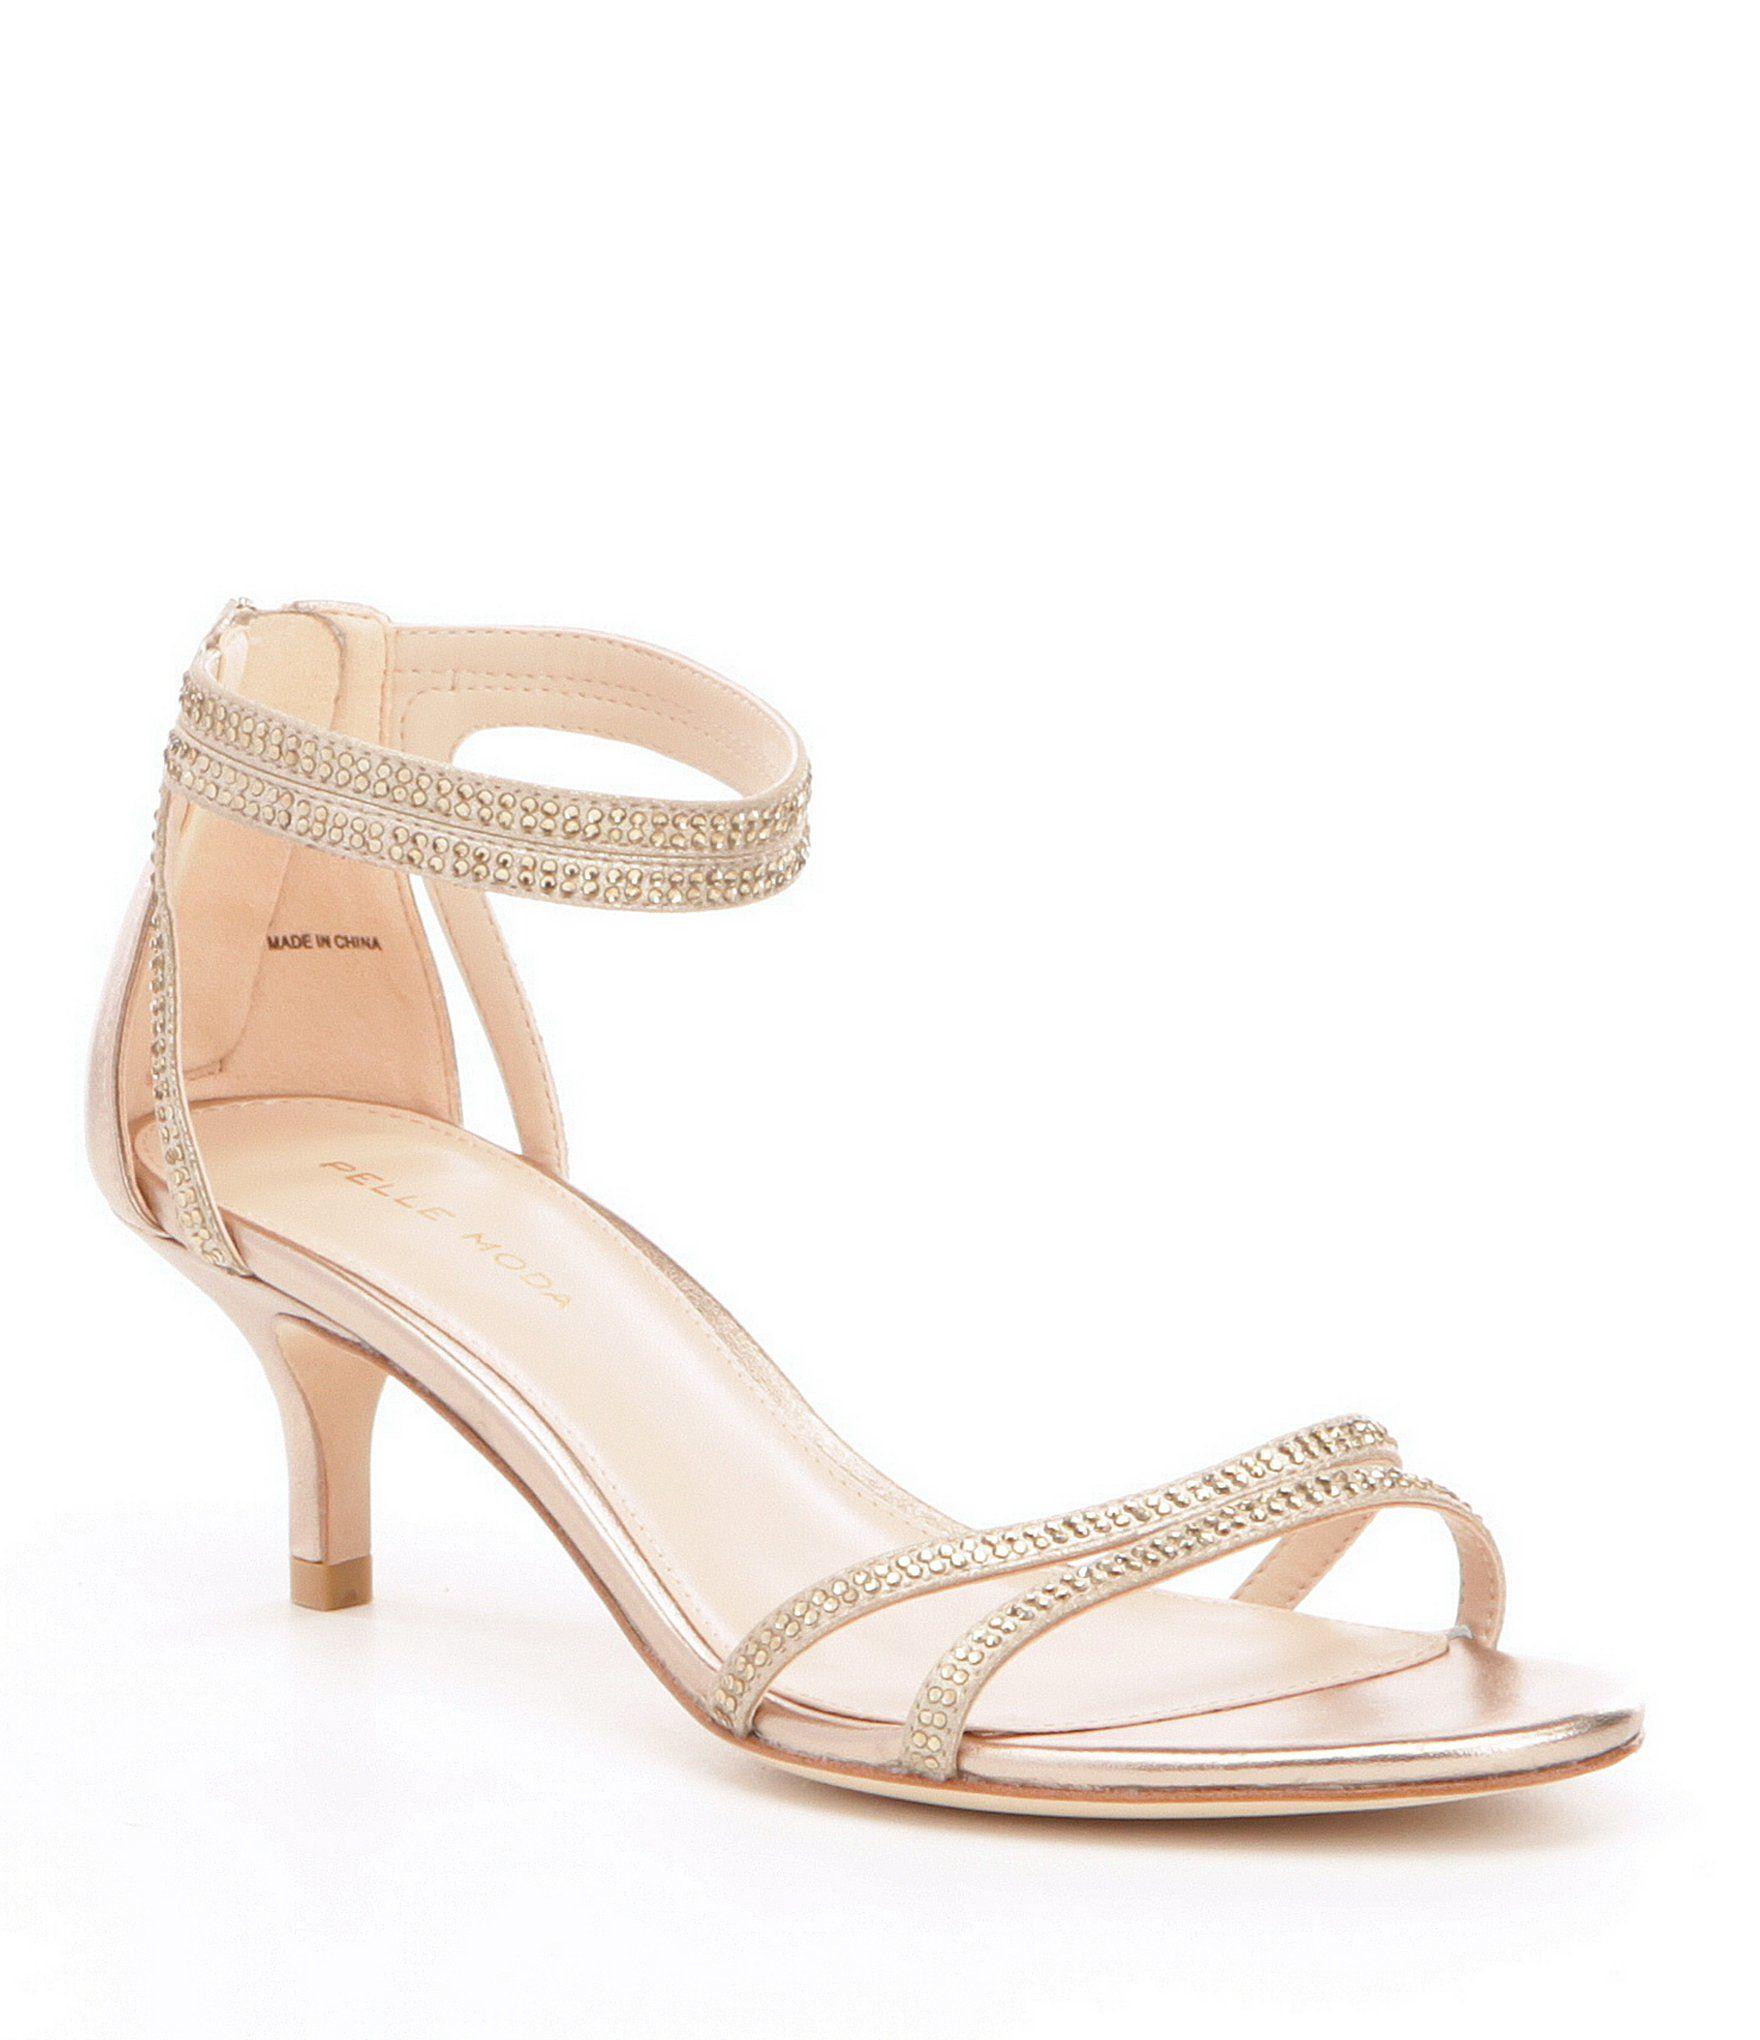 Fillis Rhinestone Detail Suede Kitten-Heel Ankle Strap Dress Sandals llOjN4